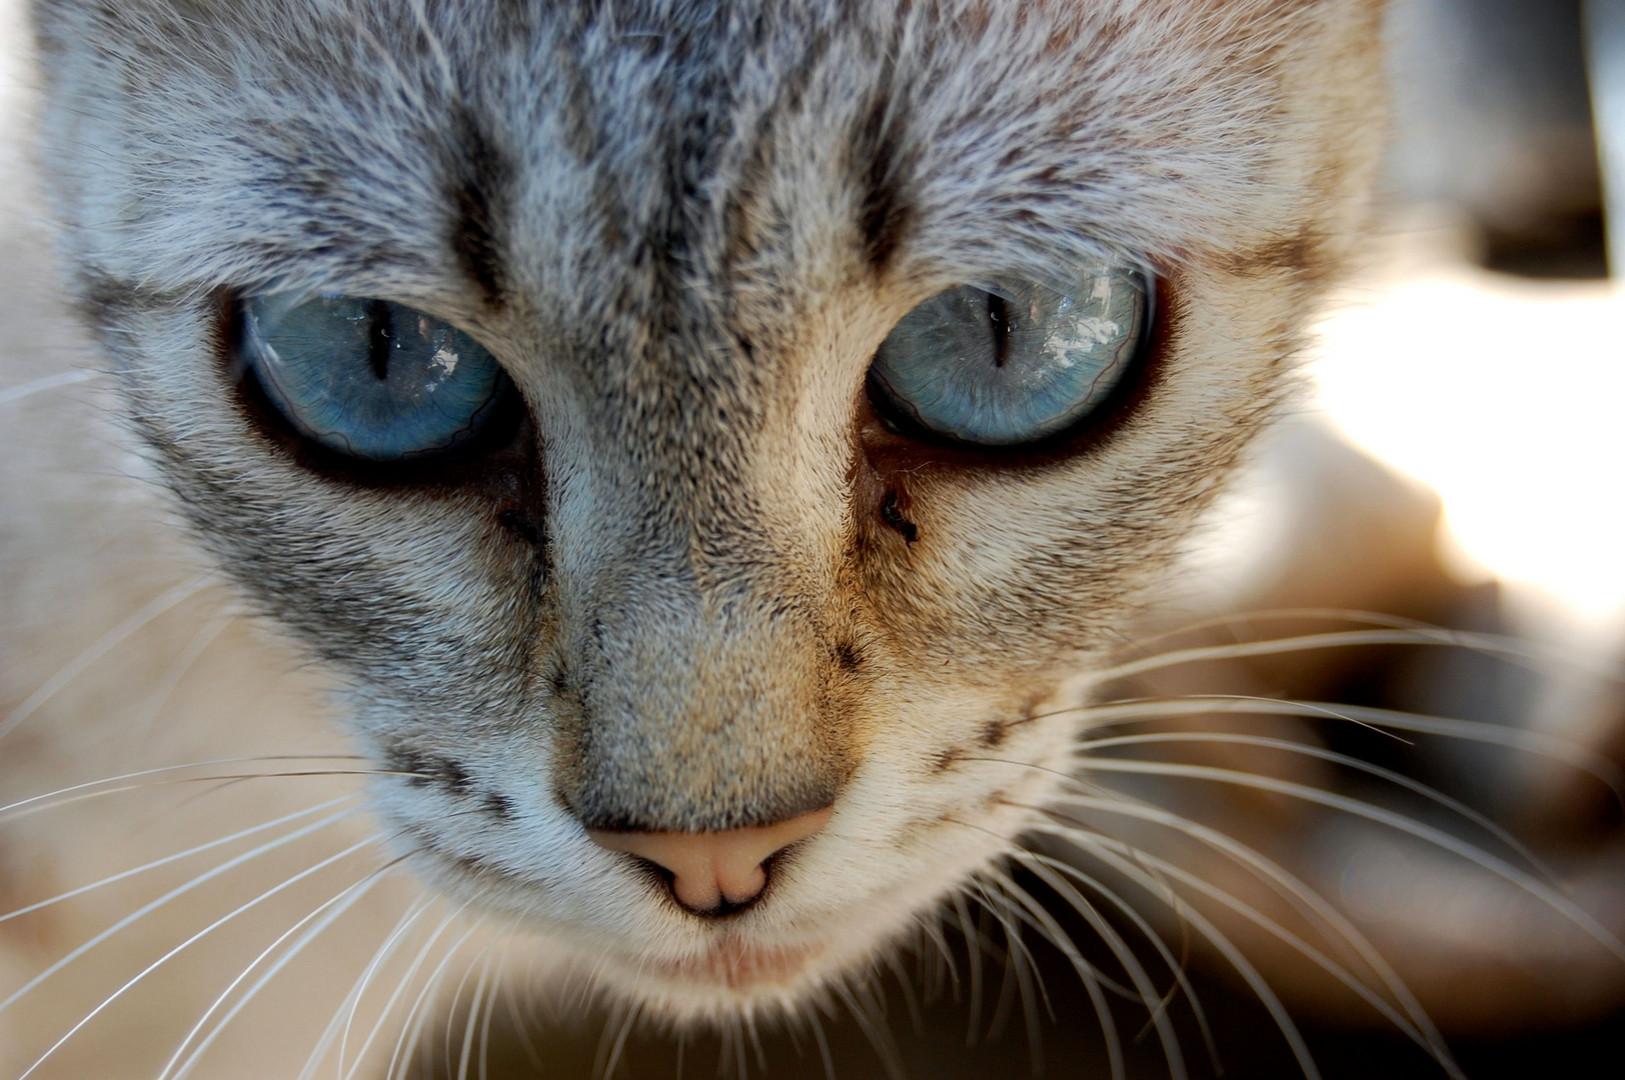 catorce vidas son dos gatos.